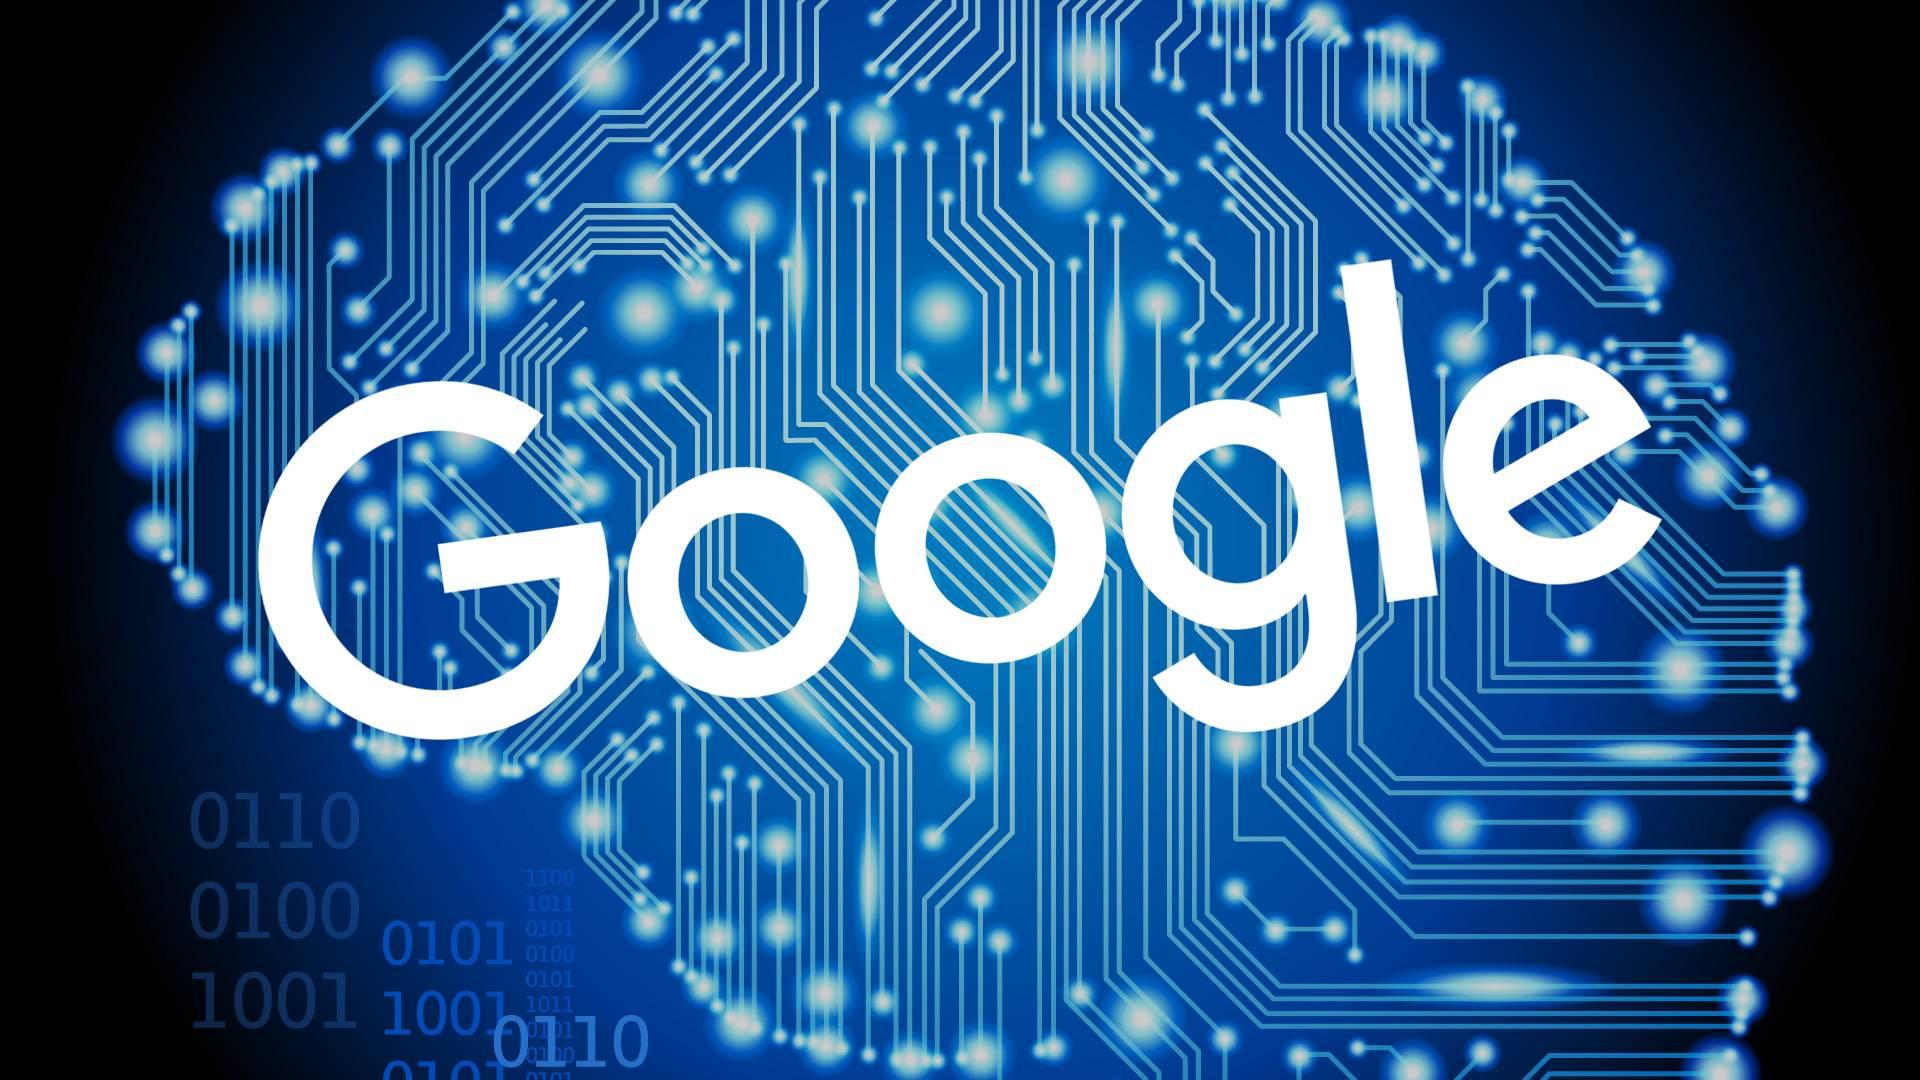 Google Brain团队问答全录:改变世界的技术、模型、团队与愿景